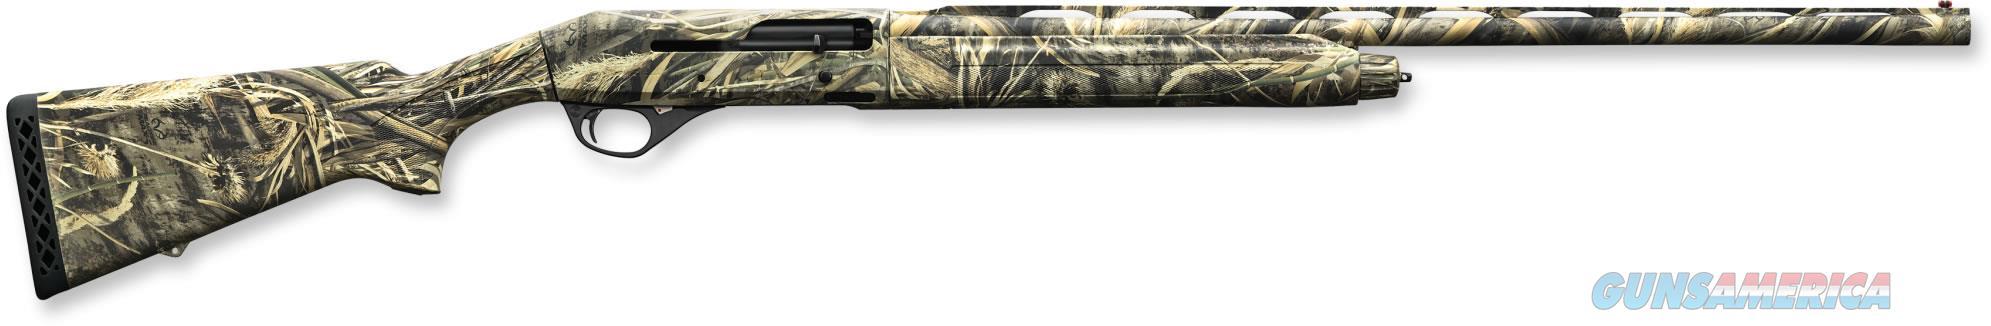 "Stoeger 3020 NIB 31822 20Ga Max5 28"" Barrel  Guns > Shotguns > Stoeger Shotguns"